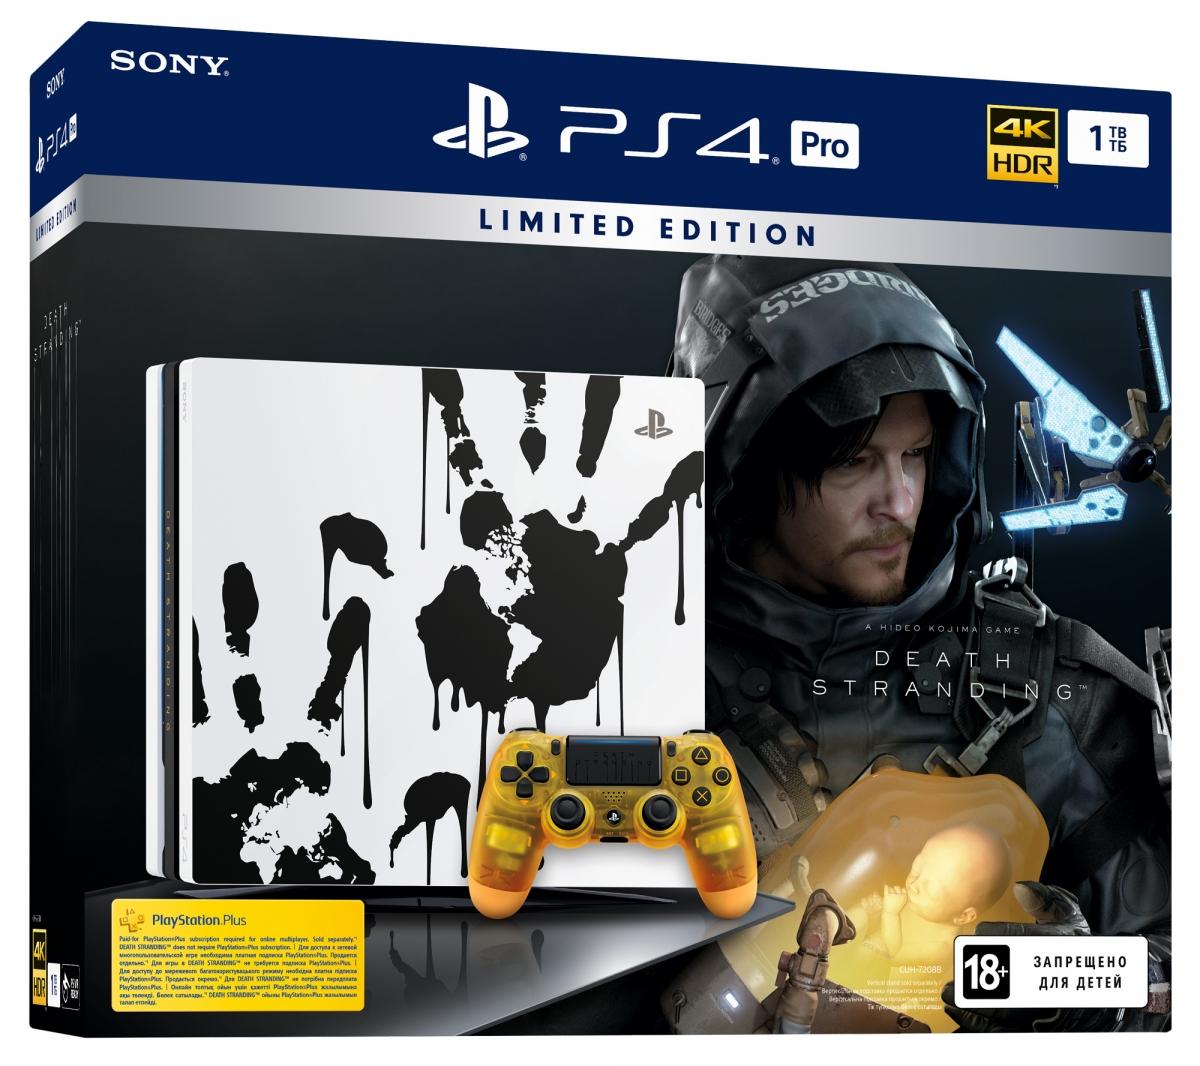 Sony PlayStation 4 Pro 1Tb Black (Death Stranding) Limited Edition